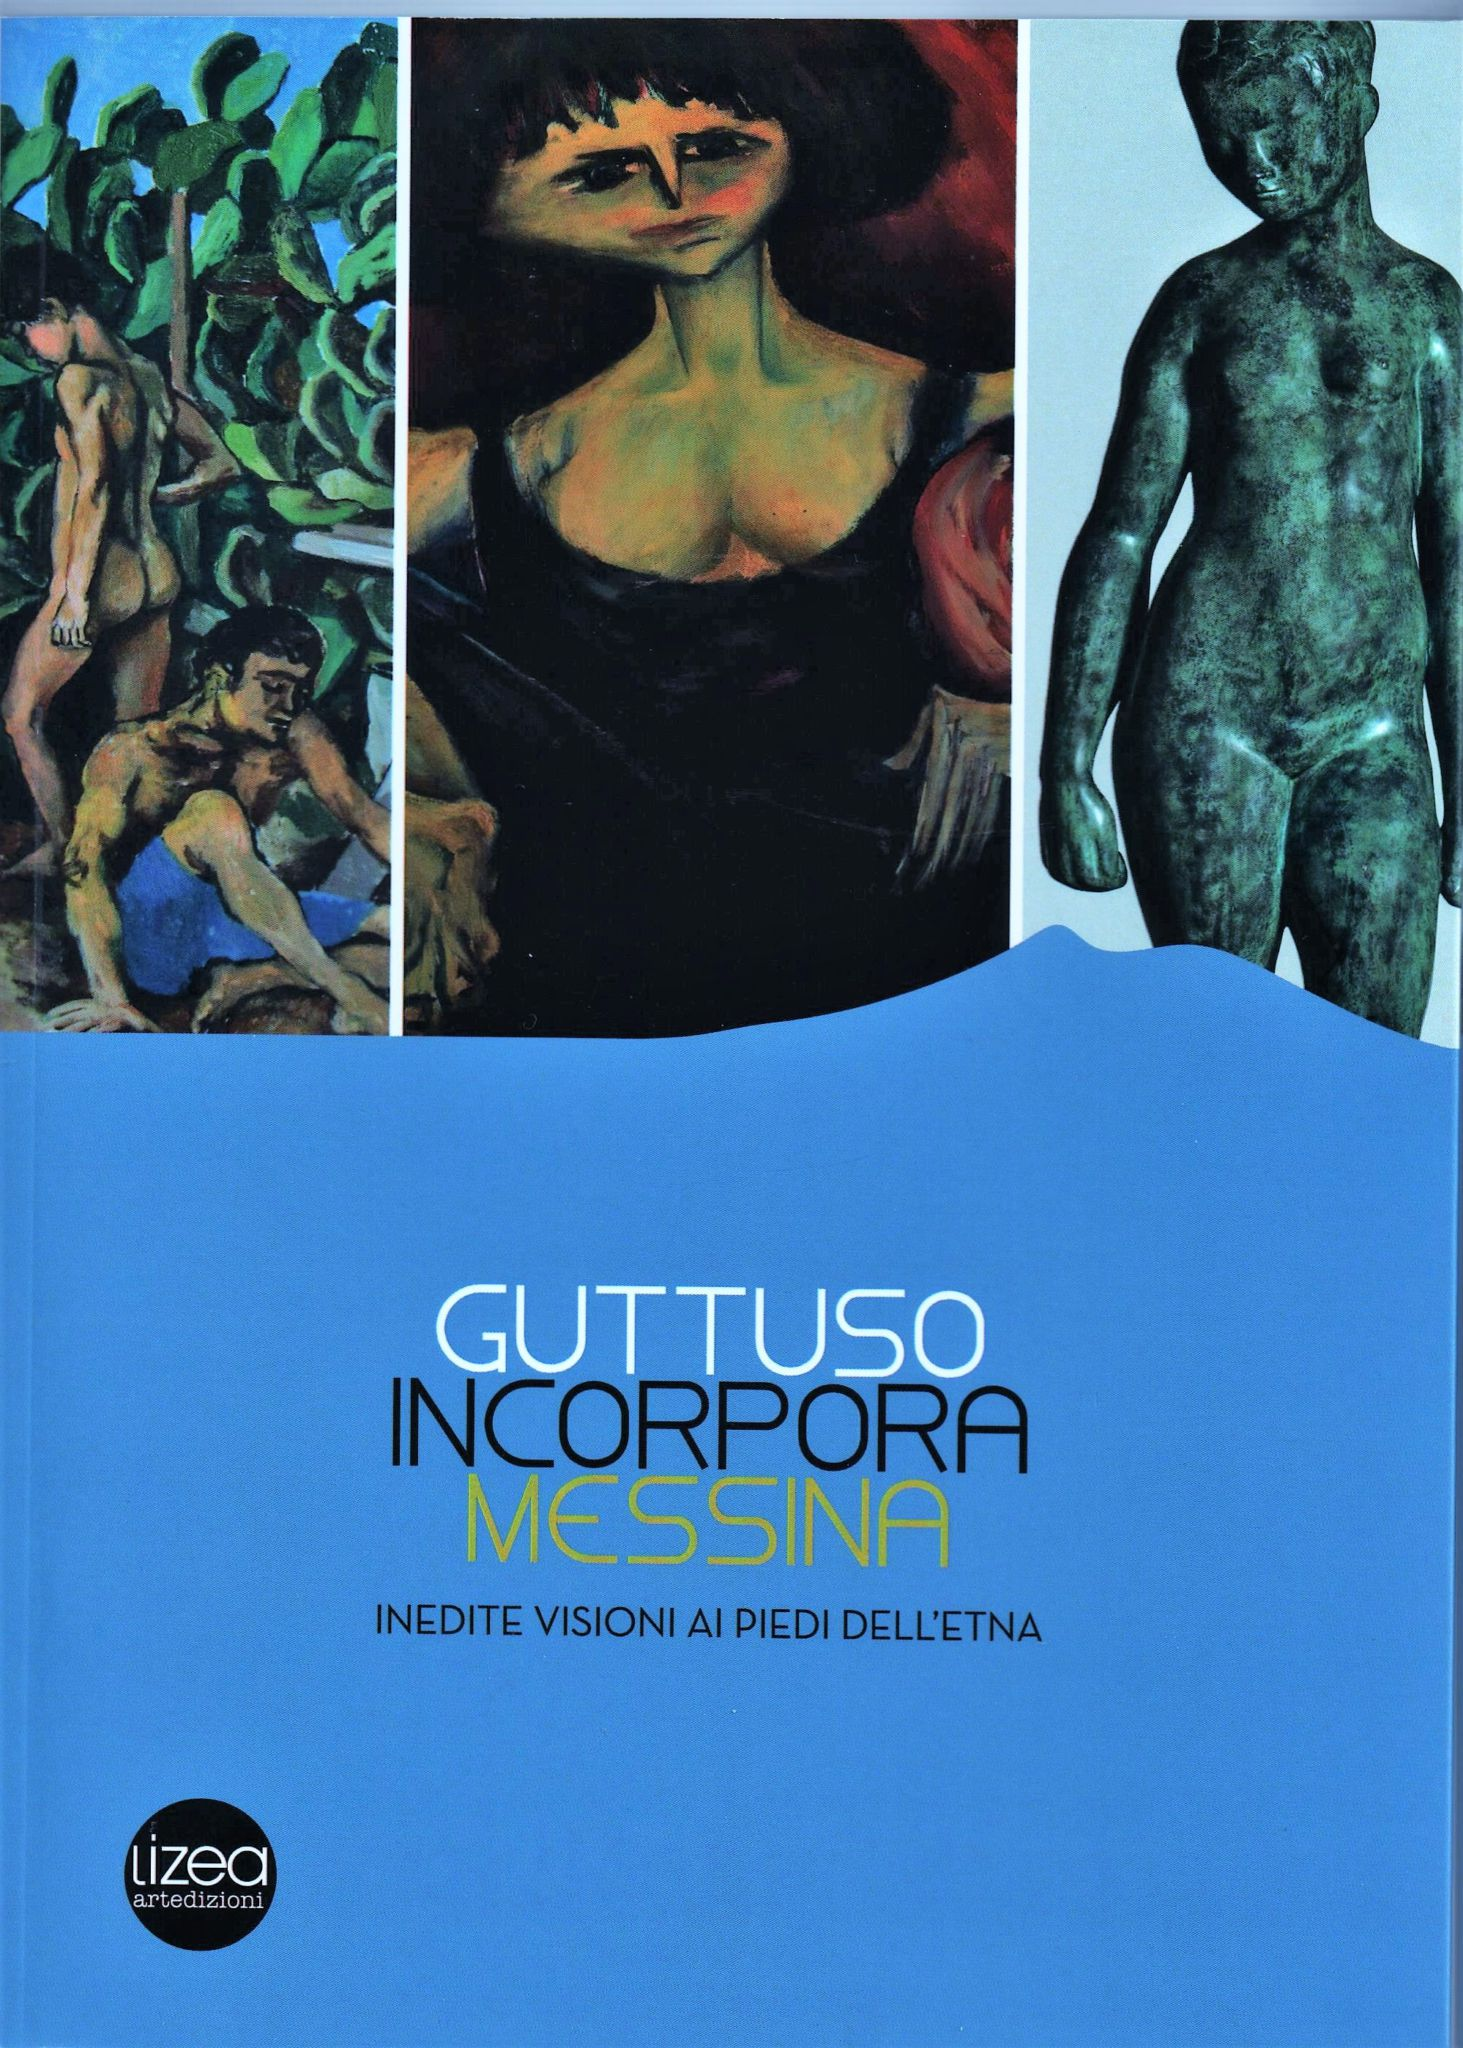 Guttuso Incorpora Messina [268725]